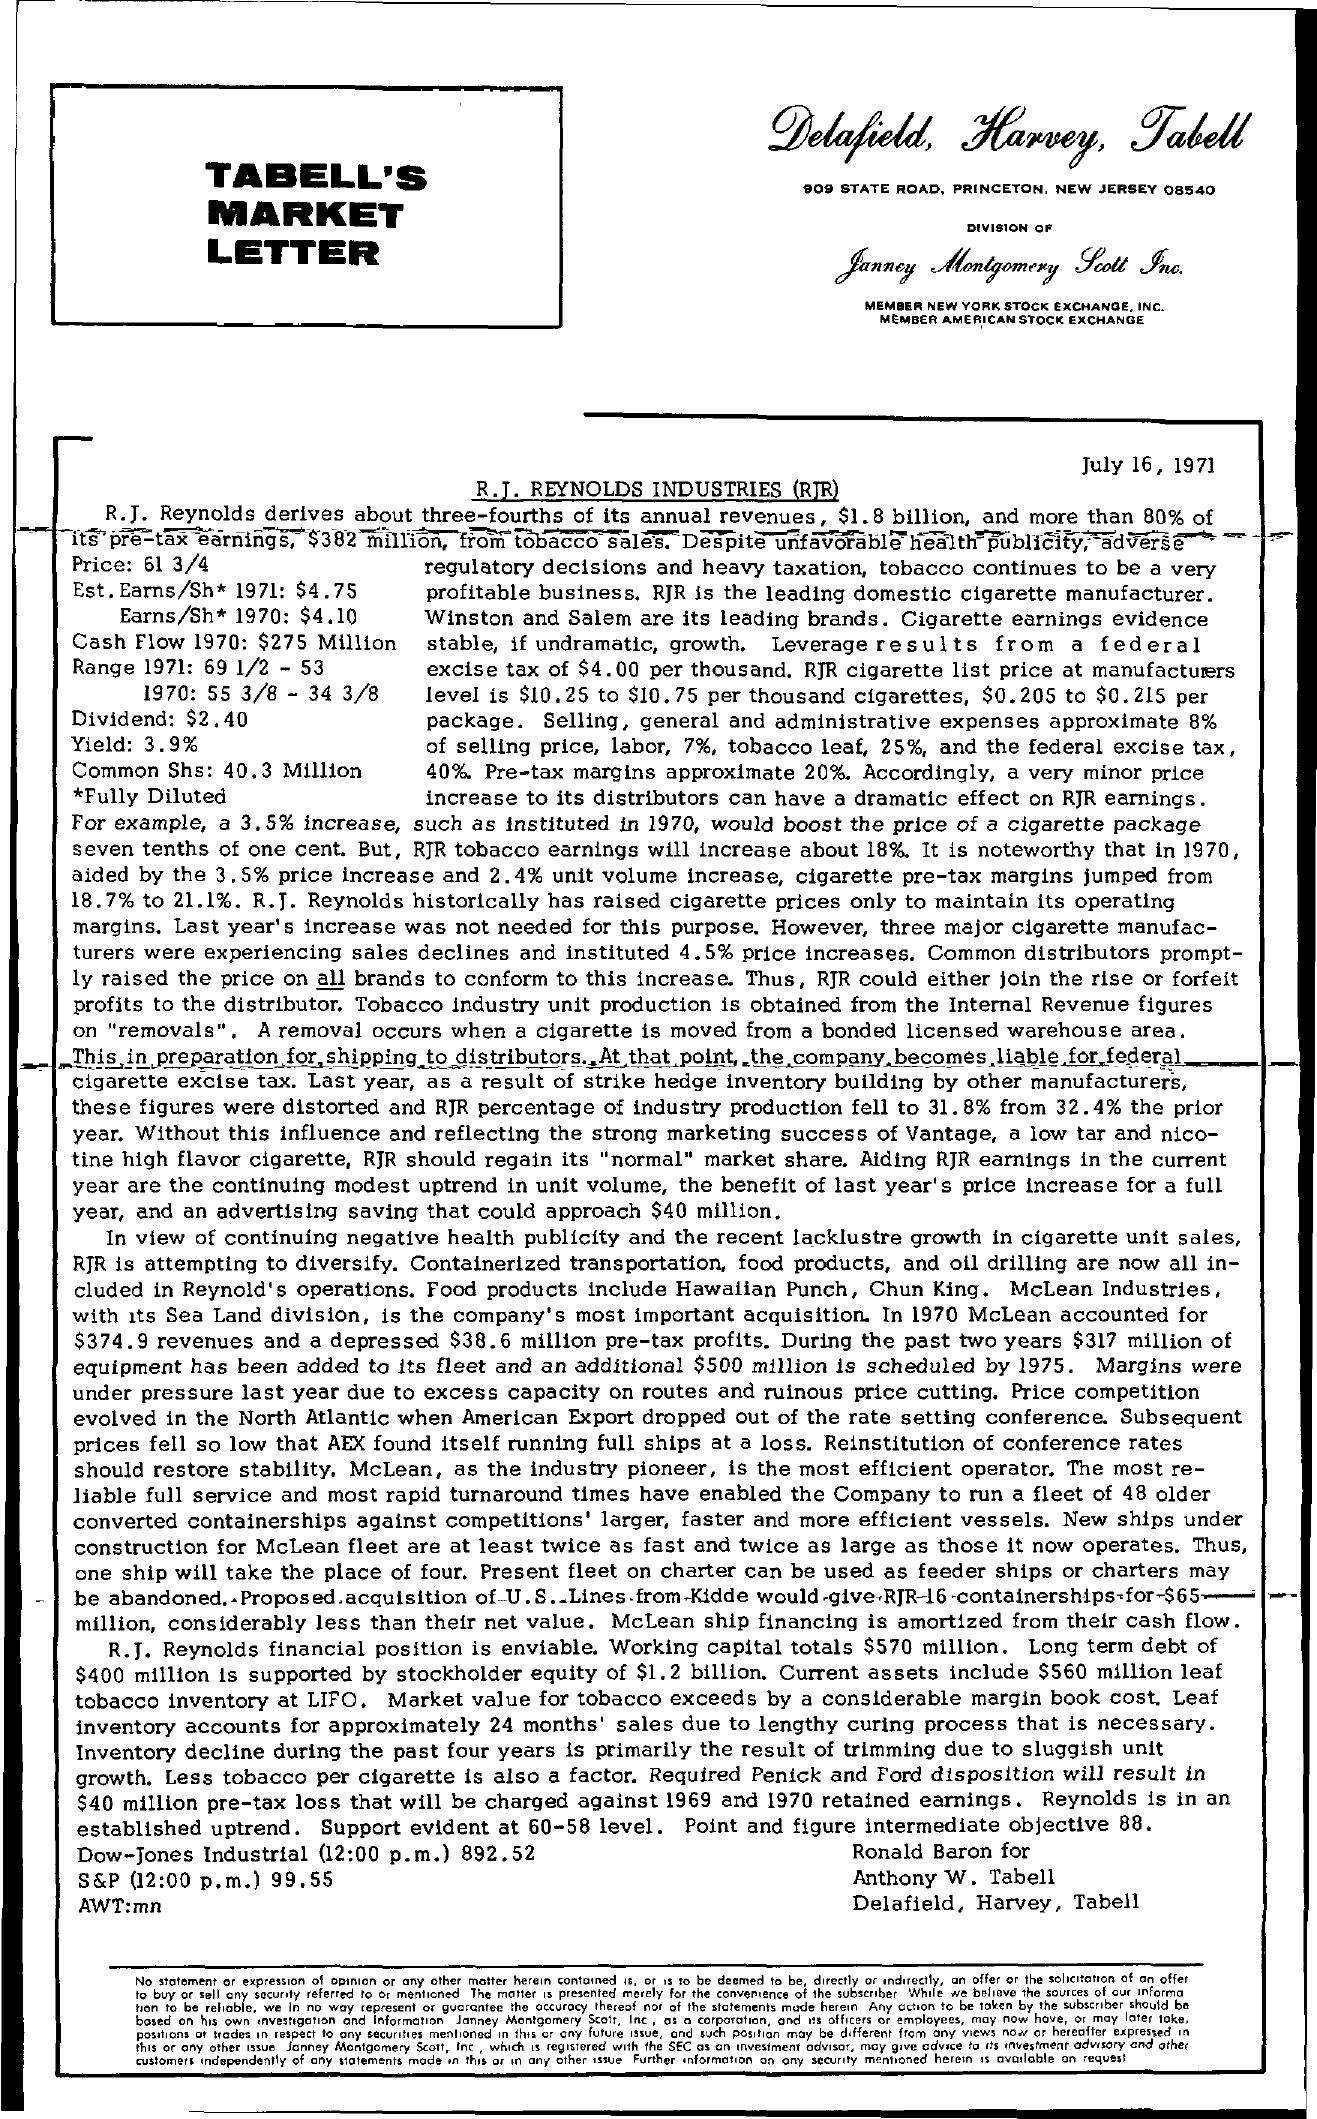 Tabell's Market Letter - July 16, 1971